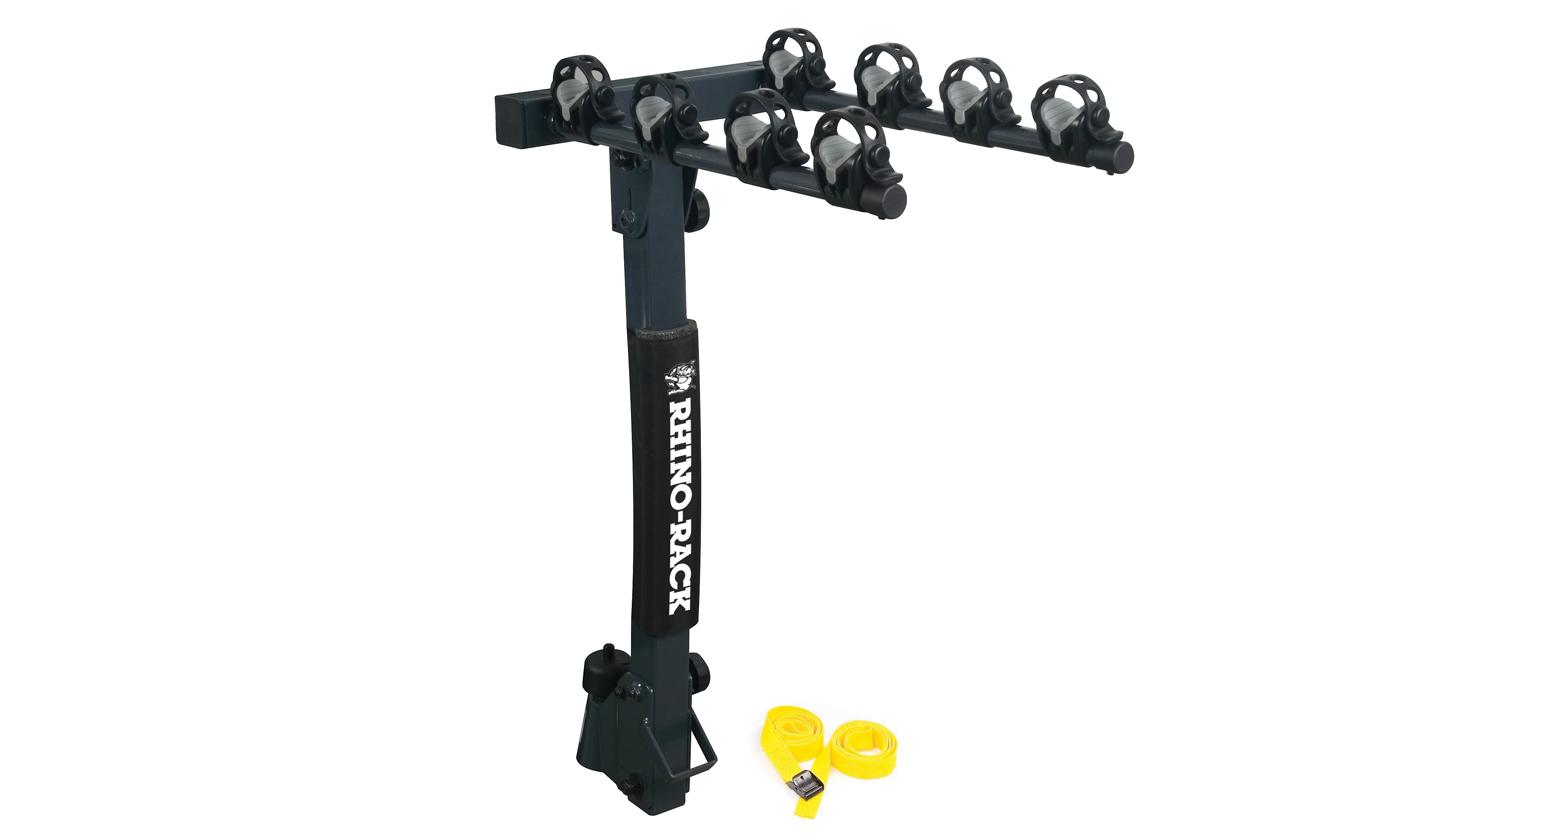 Tow ball bike rack